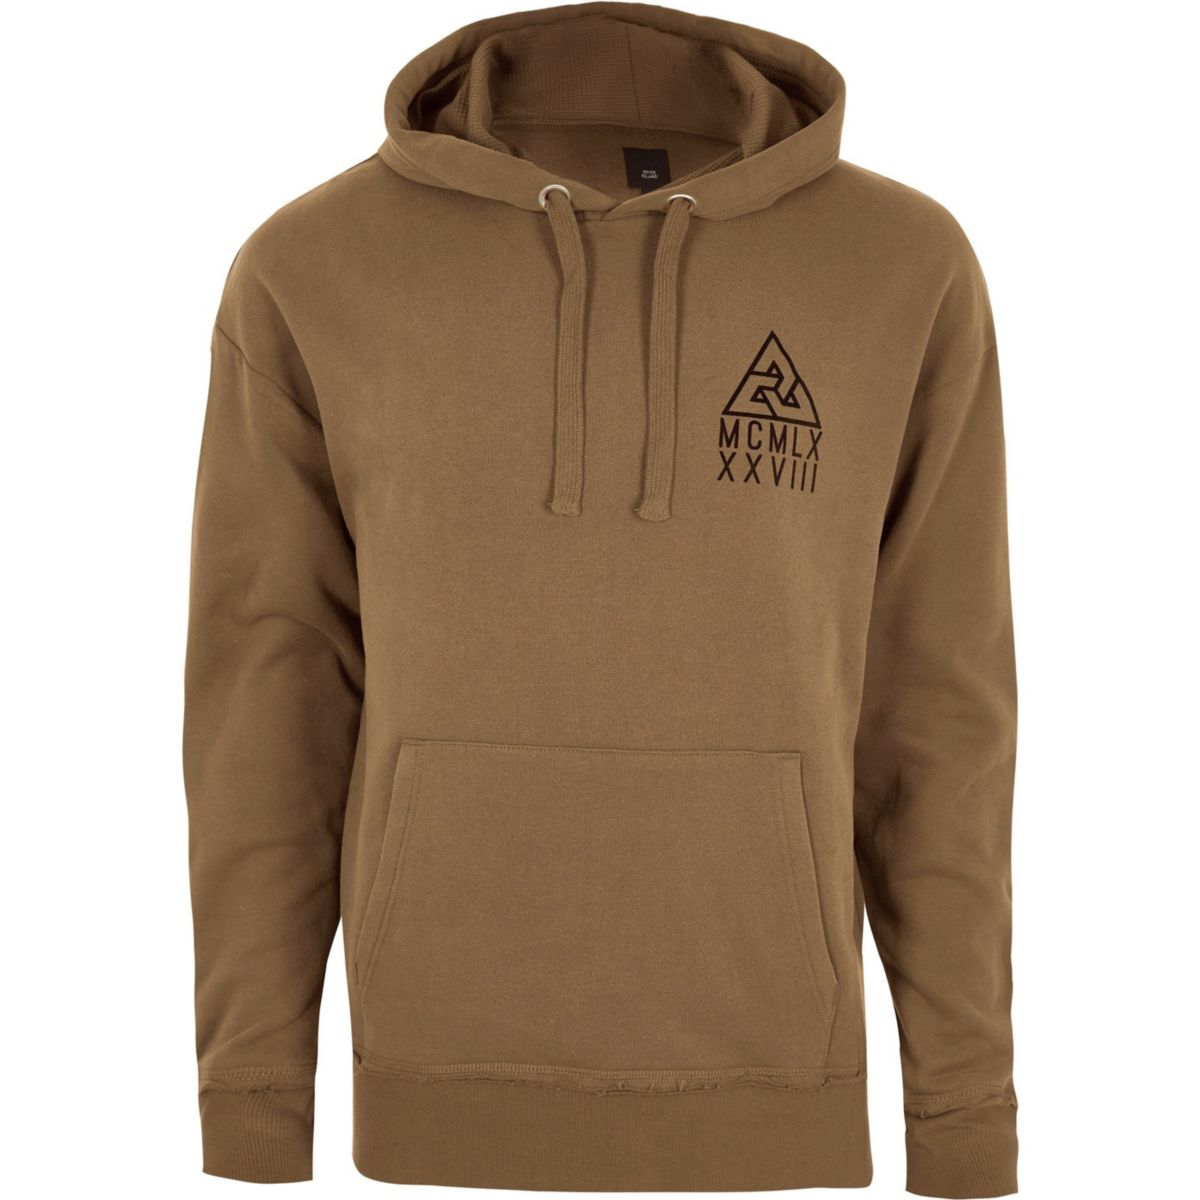 Light brown oversized hoodie